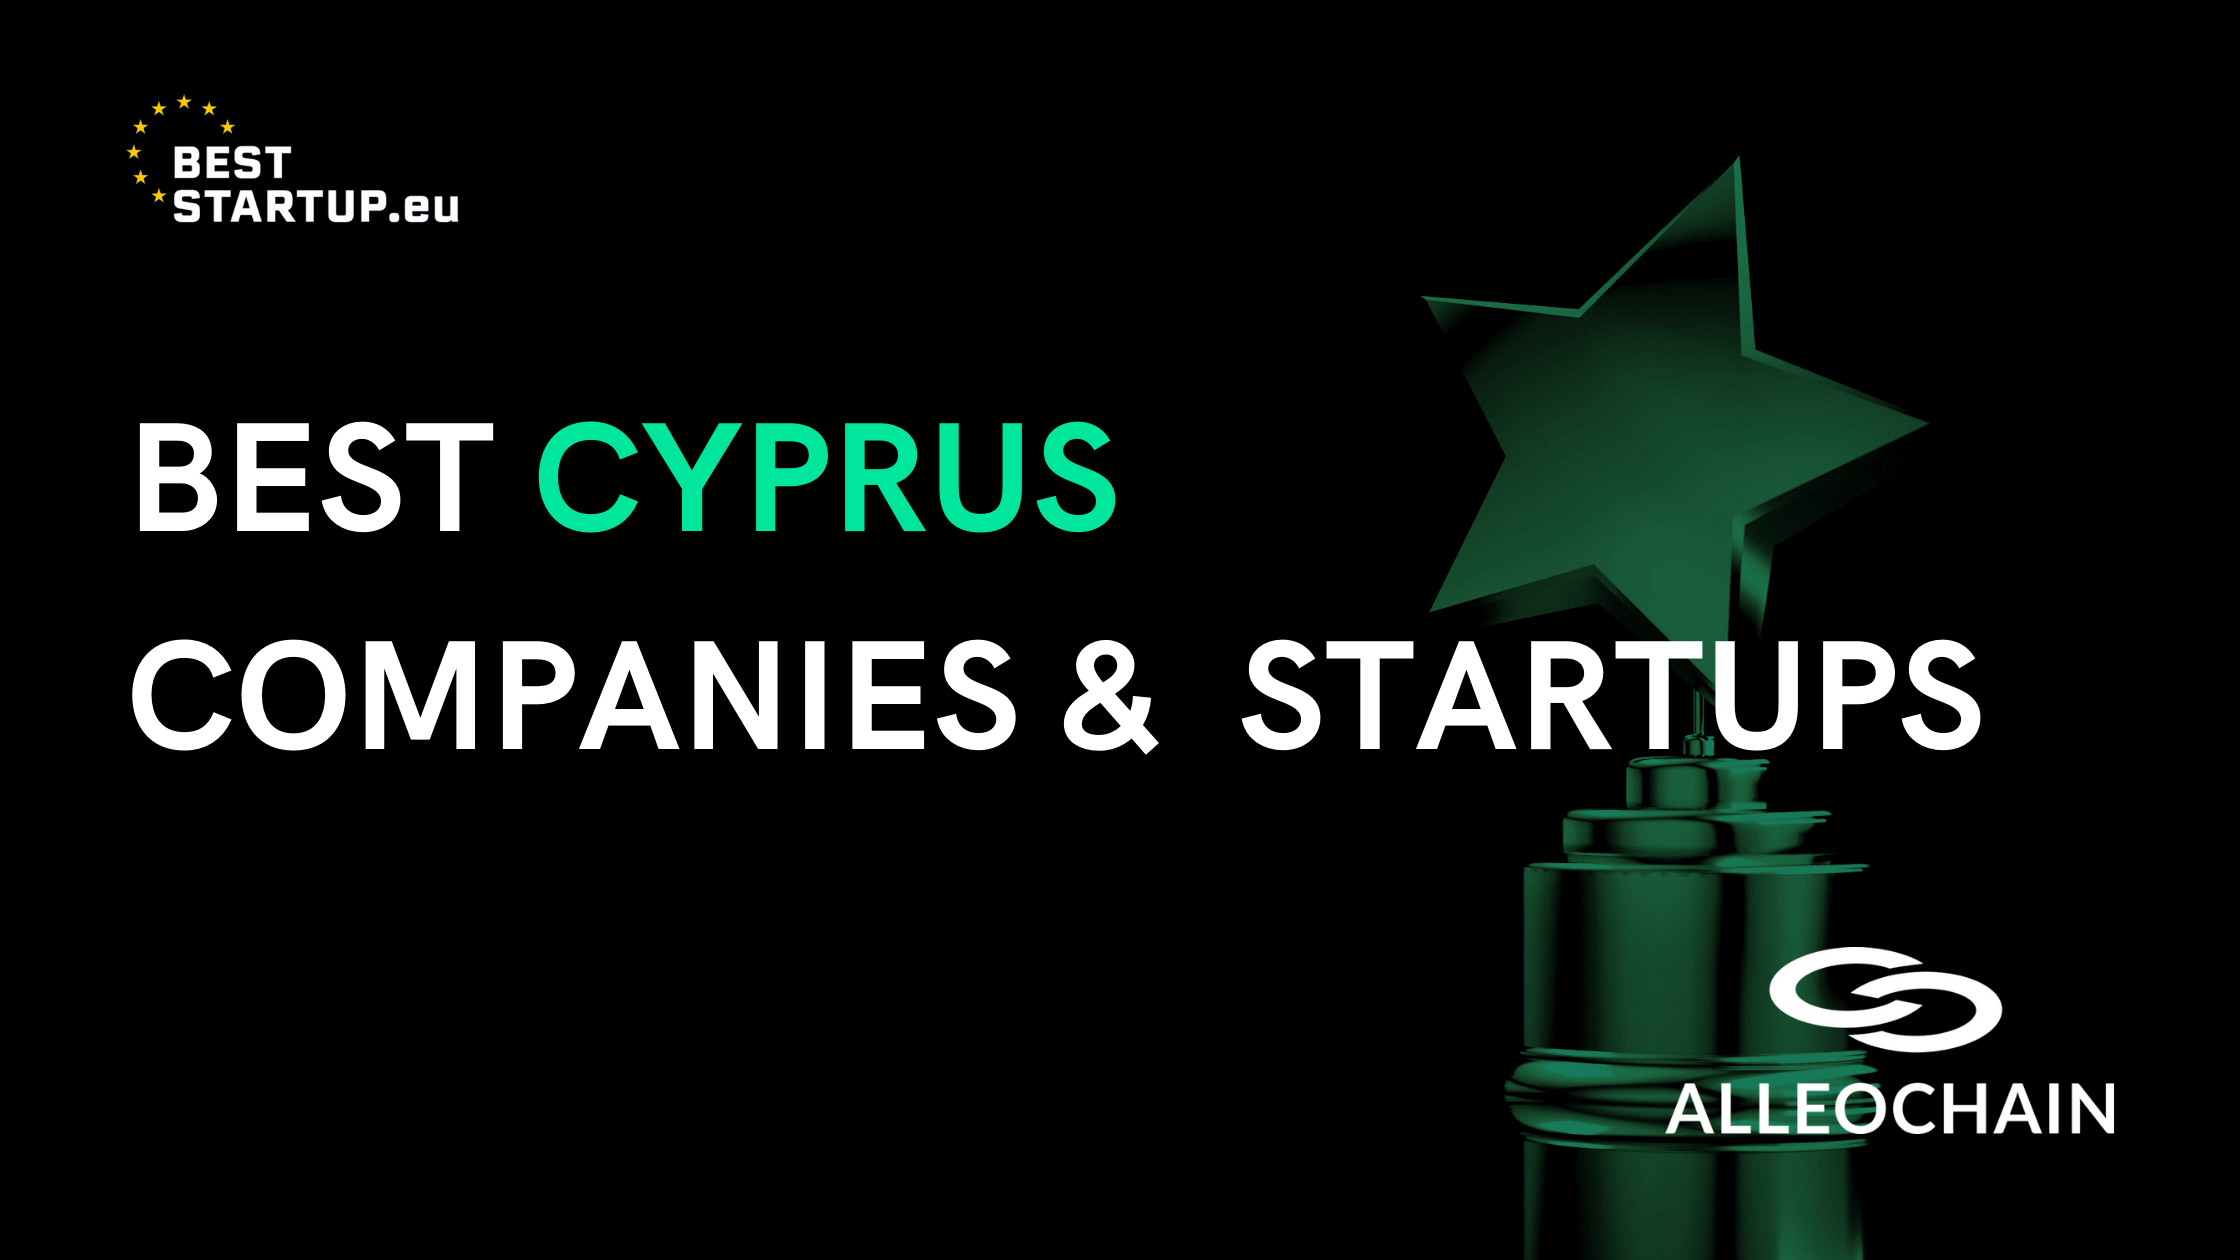 Best Cyprus IT Company